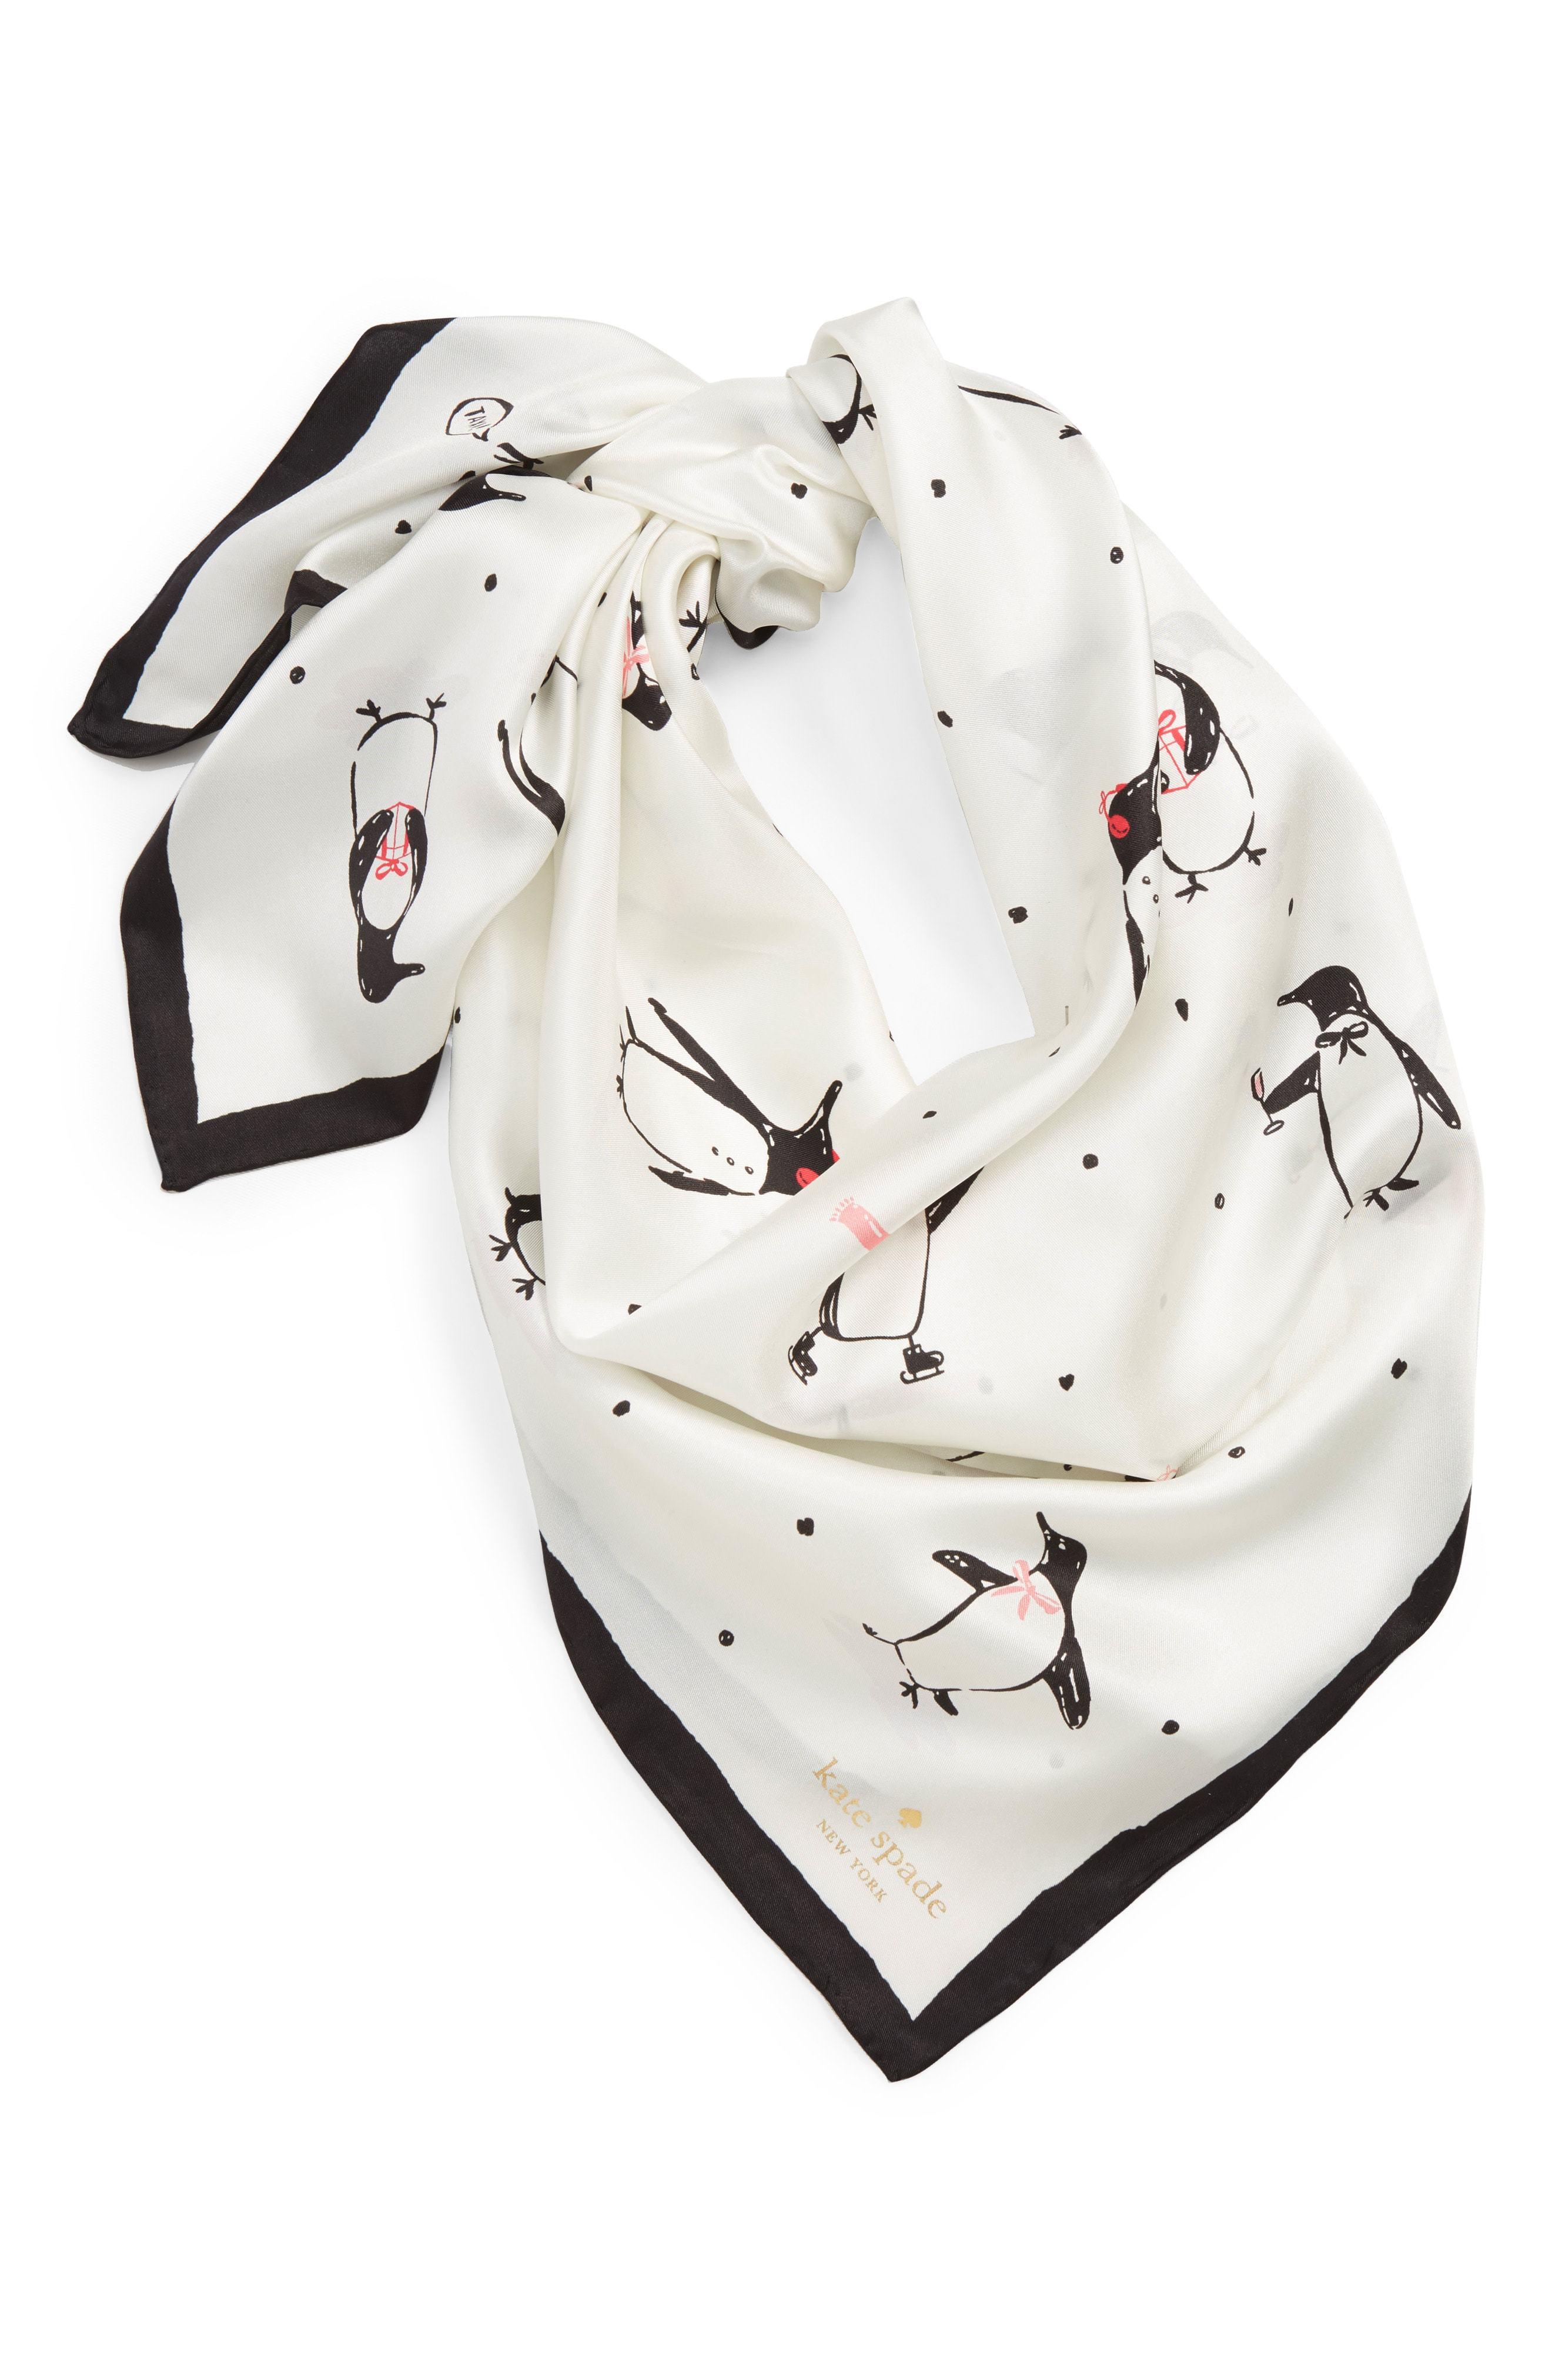 66967b9c9 ... Nordstrom › kate spade new york › White Print Silk Scarves kate spade  new york Penguin Silk Square Scarf